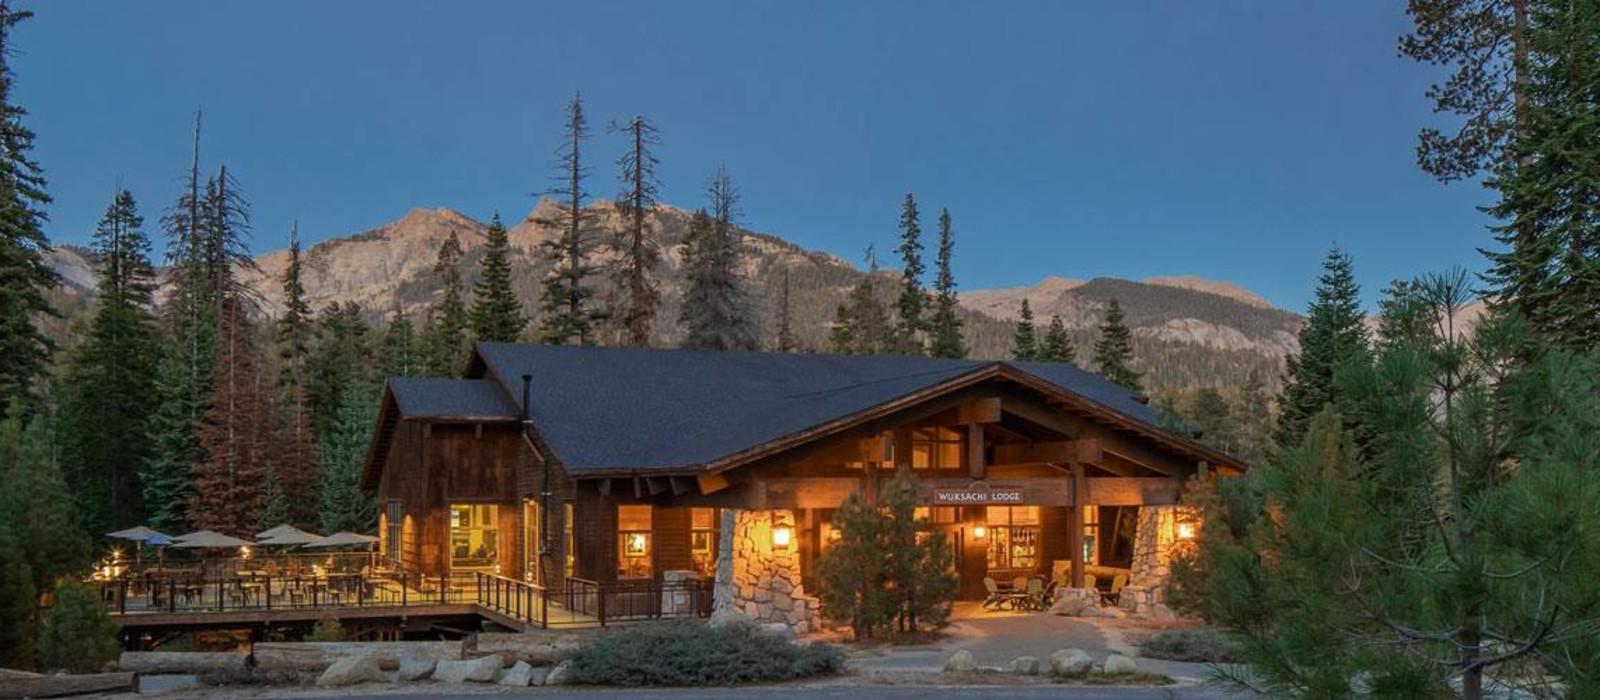 Hotel Wuksachi Lodge USA